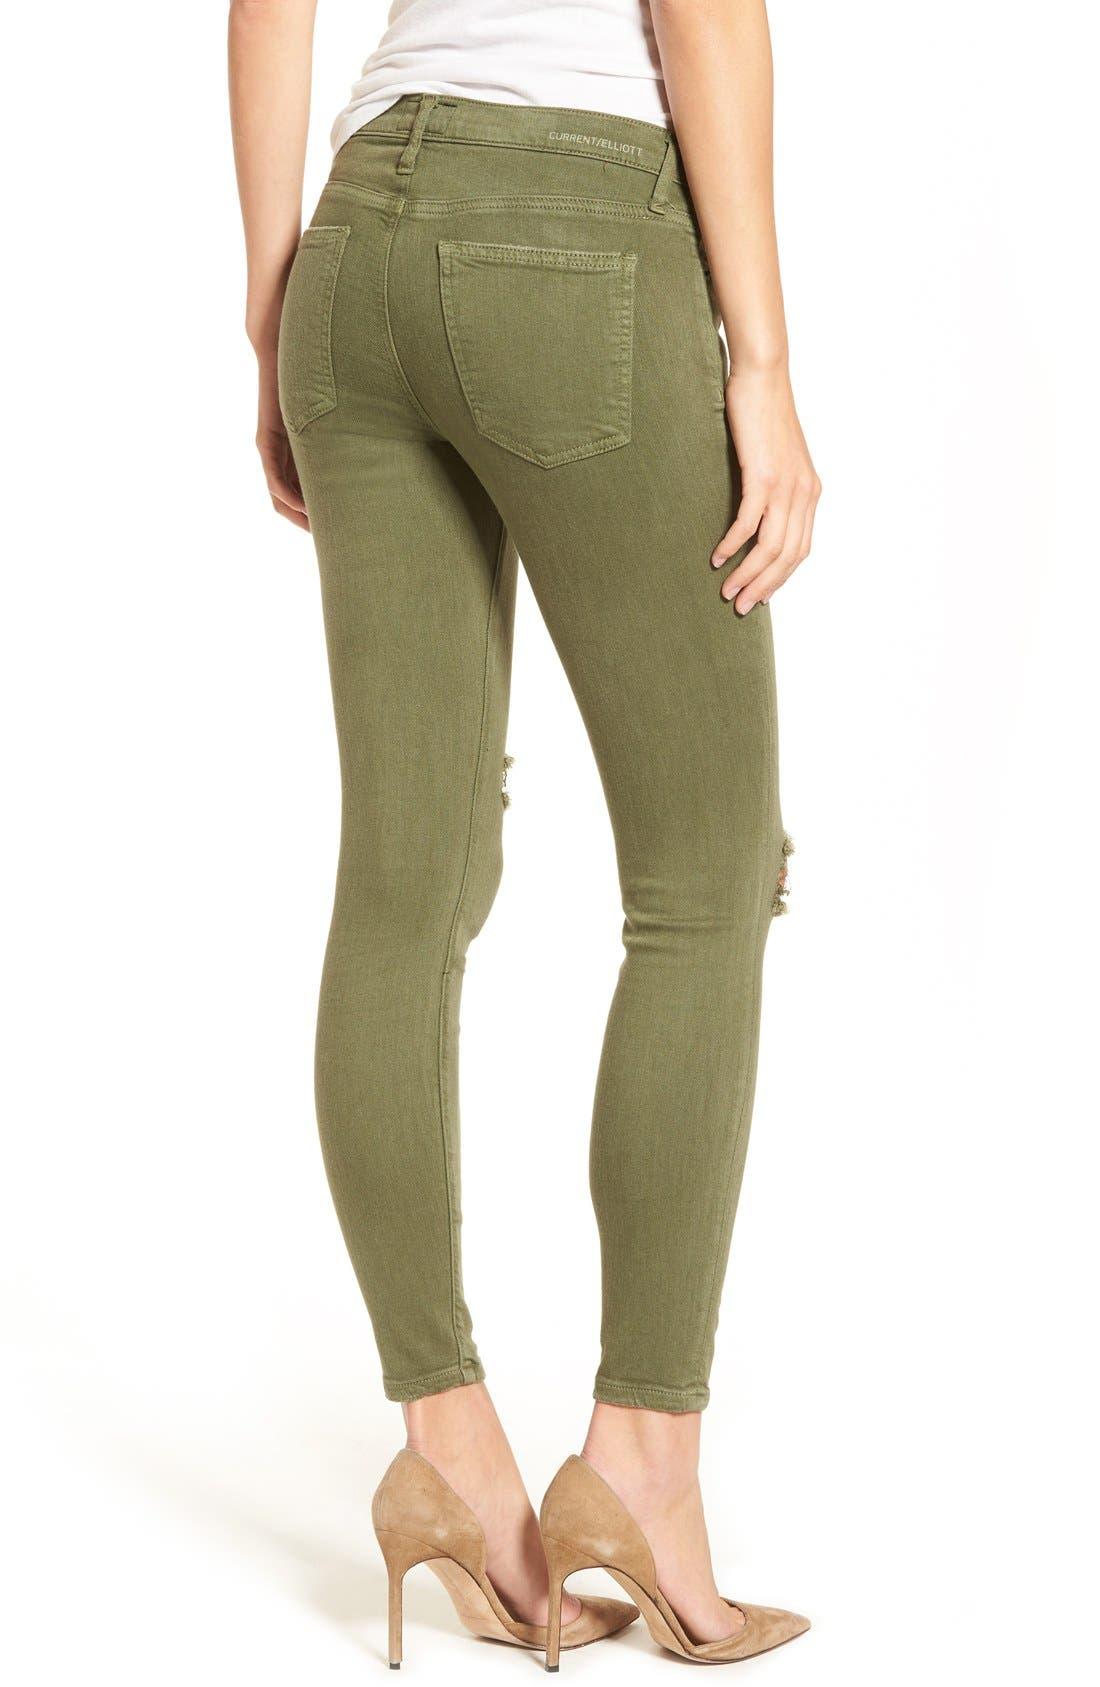 CURRENT/ELLIOTT, 'The Stiletto' Crop Skinny Jeans, Alternate thumbnail 4, color, 309